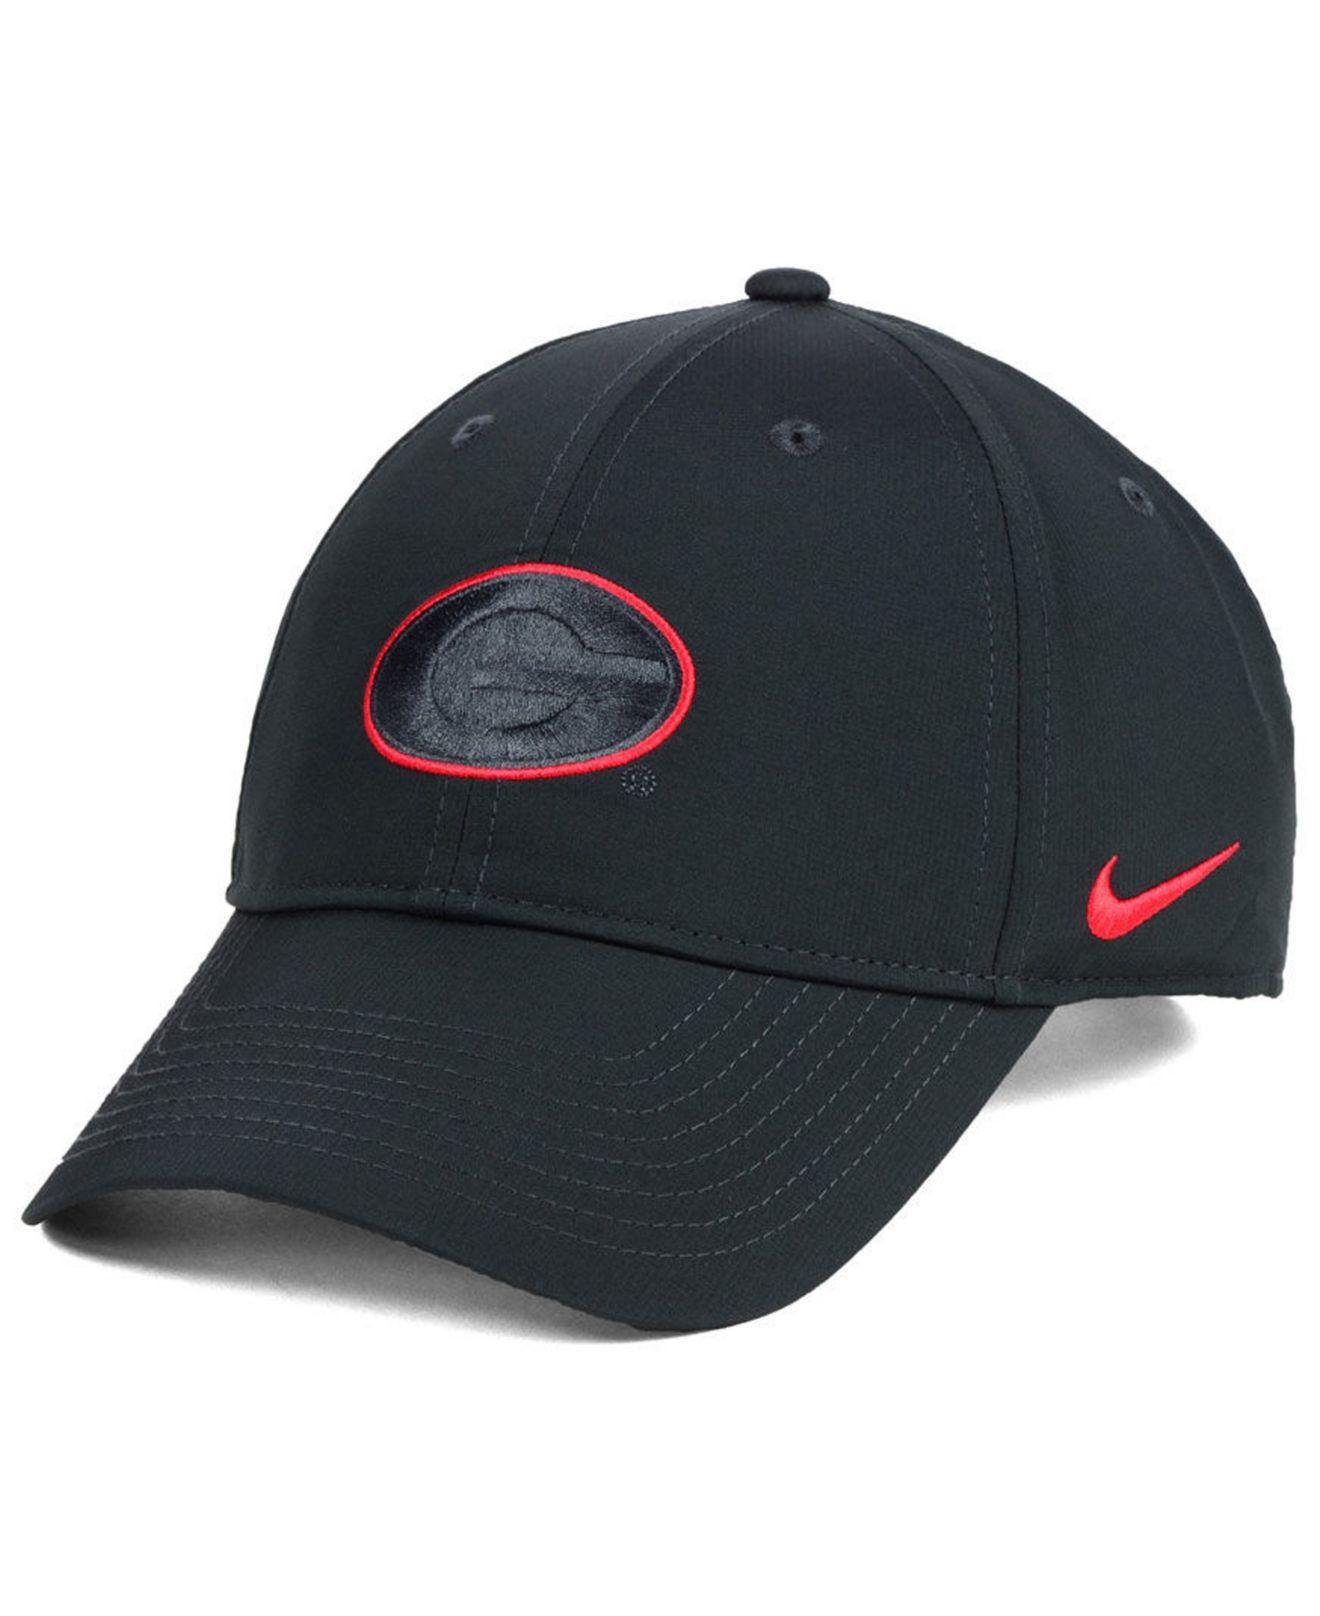 Lyst - Nike Georgia Bulldogs Dri-fit Adjustable Cap in Blue for Men 01c4e4dcabf